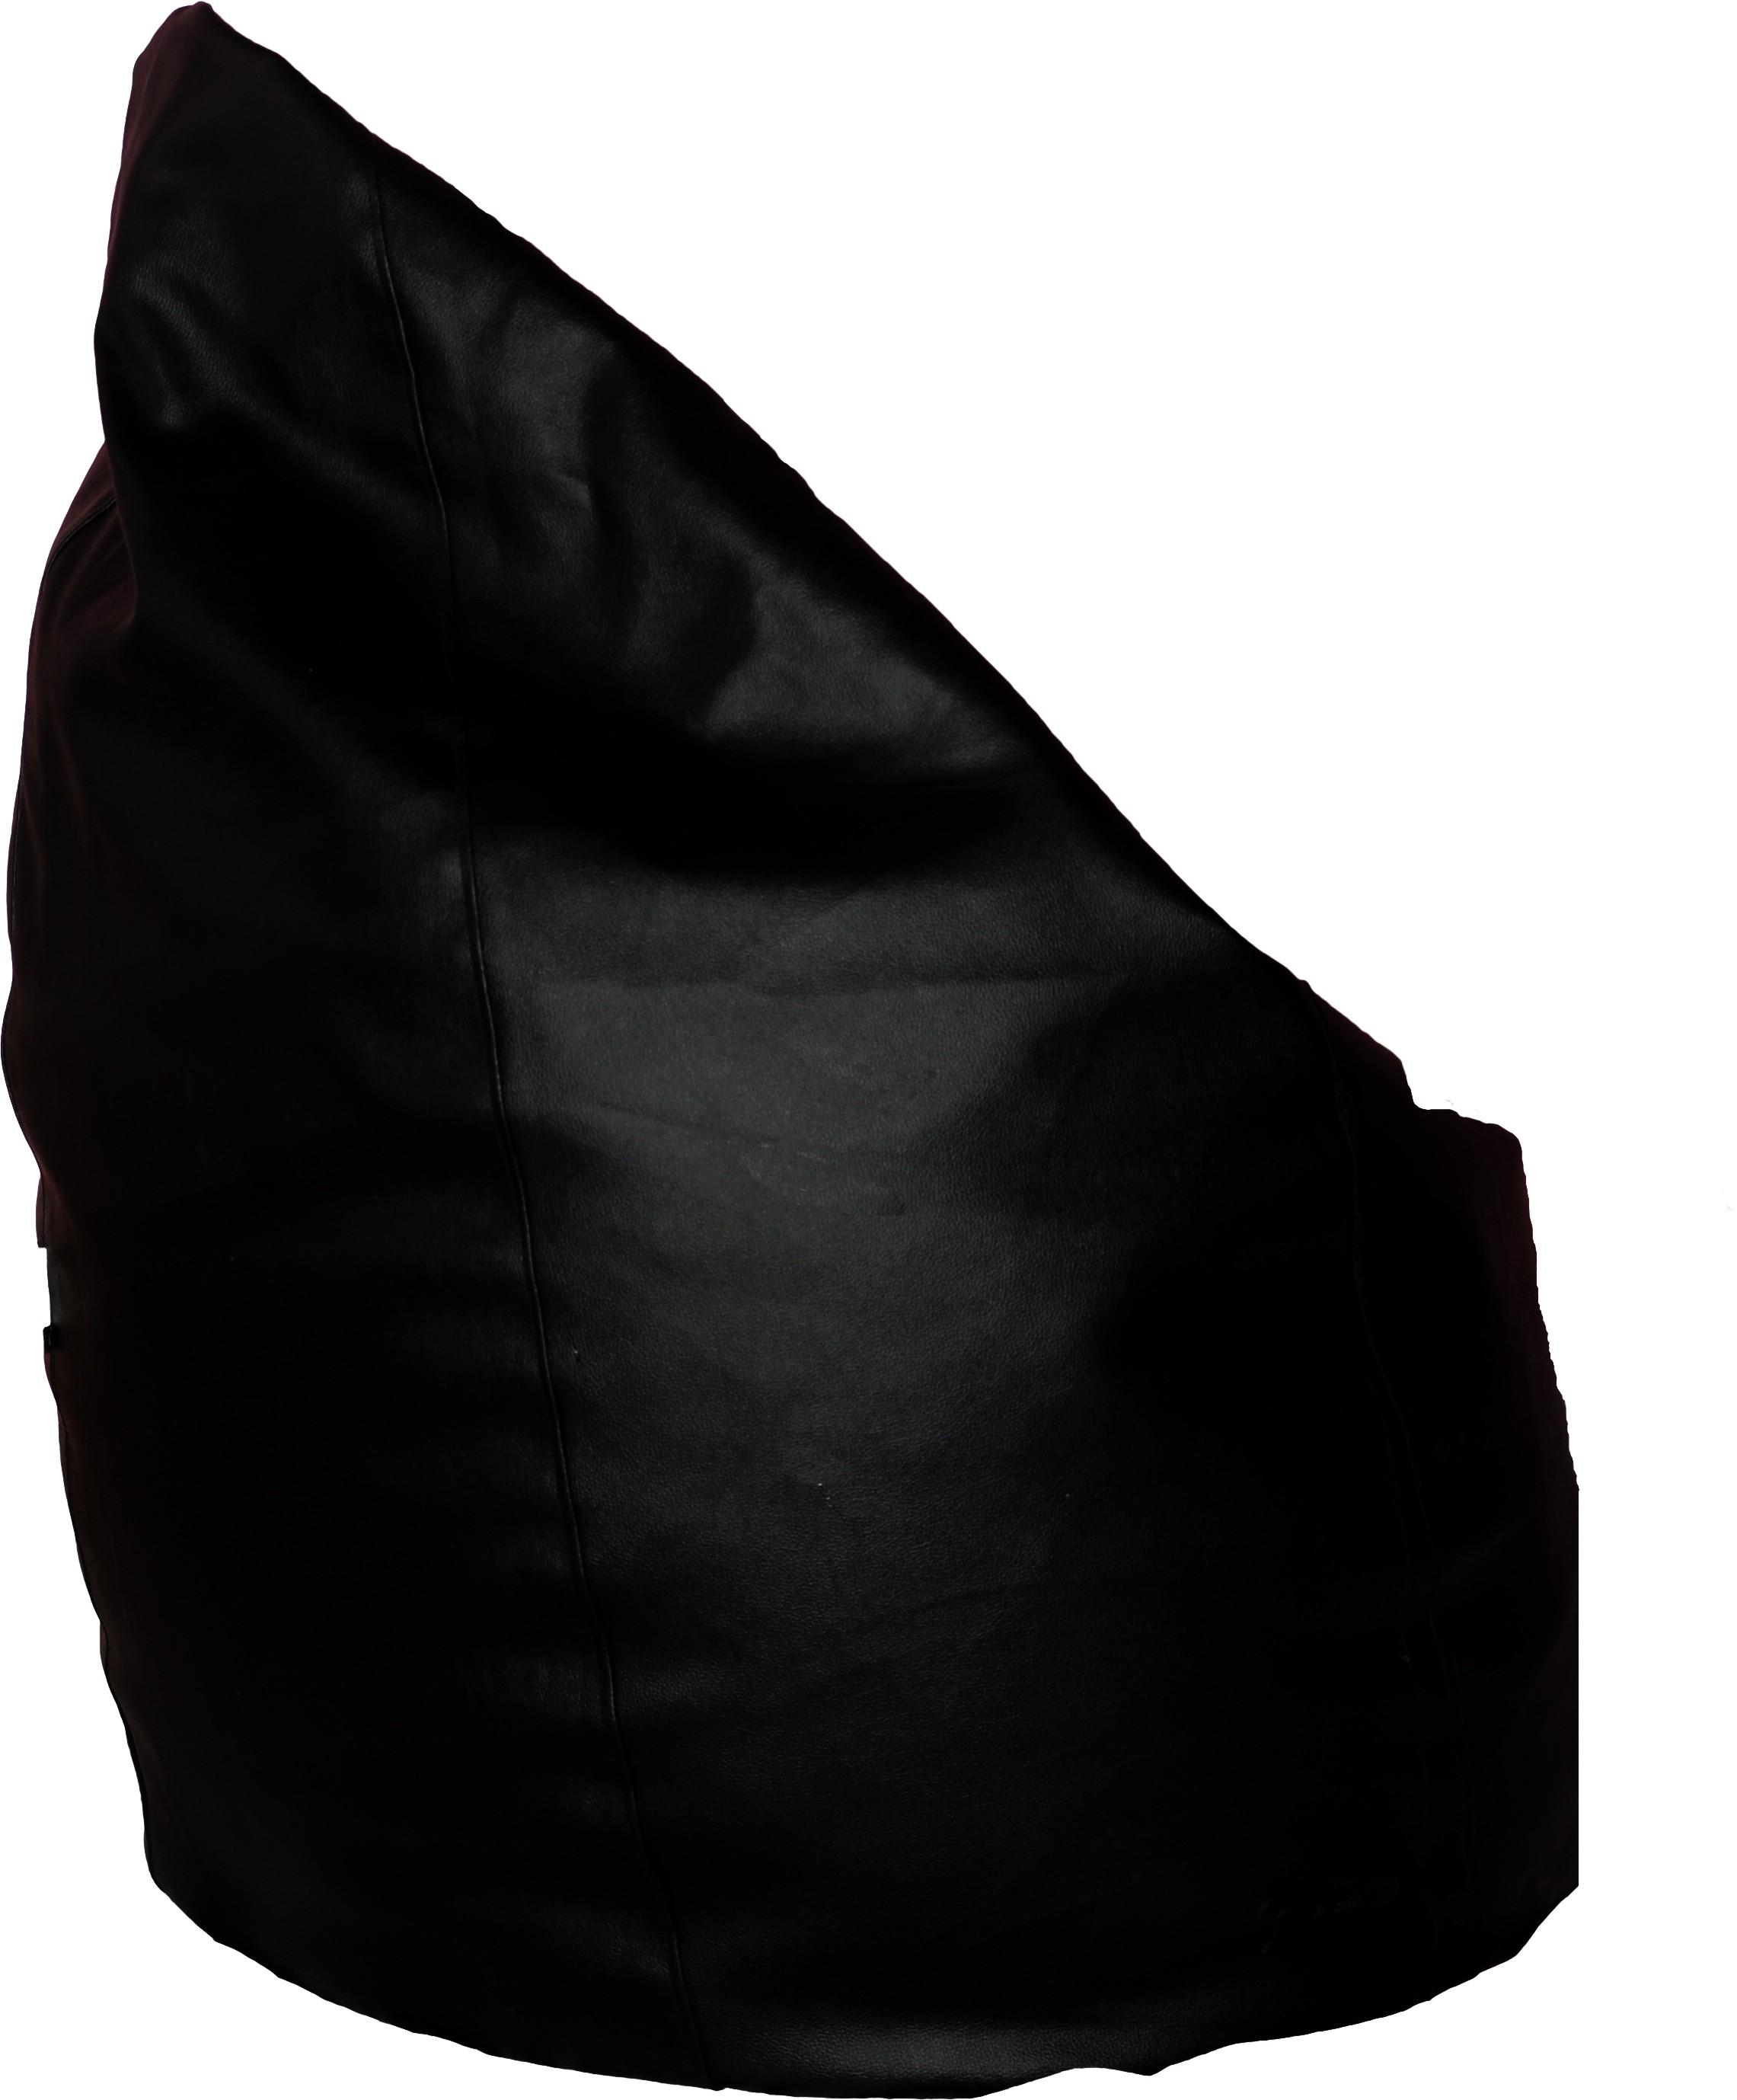 View Amaze XXL Bean Bag Cover(Black) Furniture (Amaze)